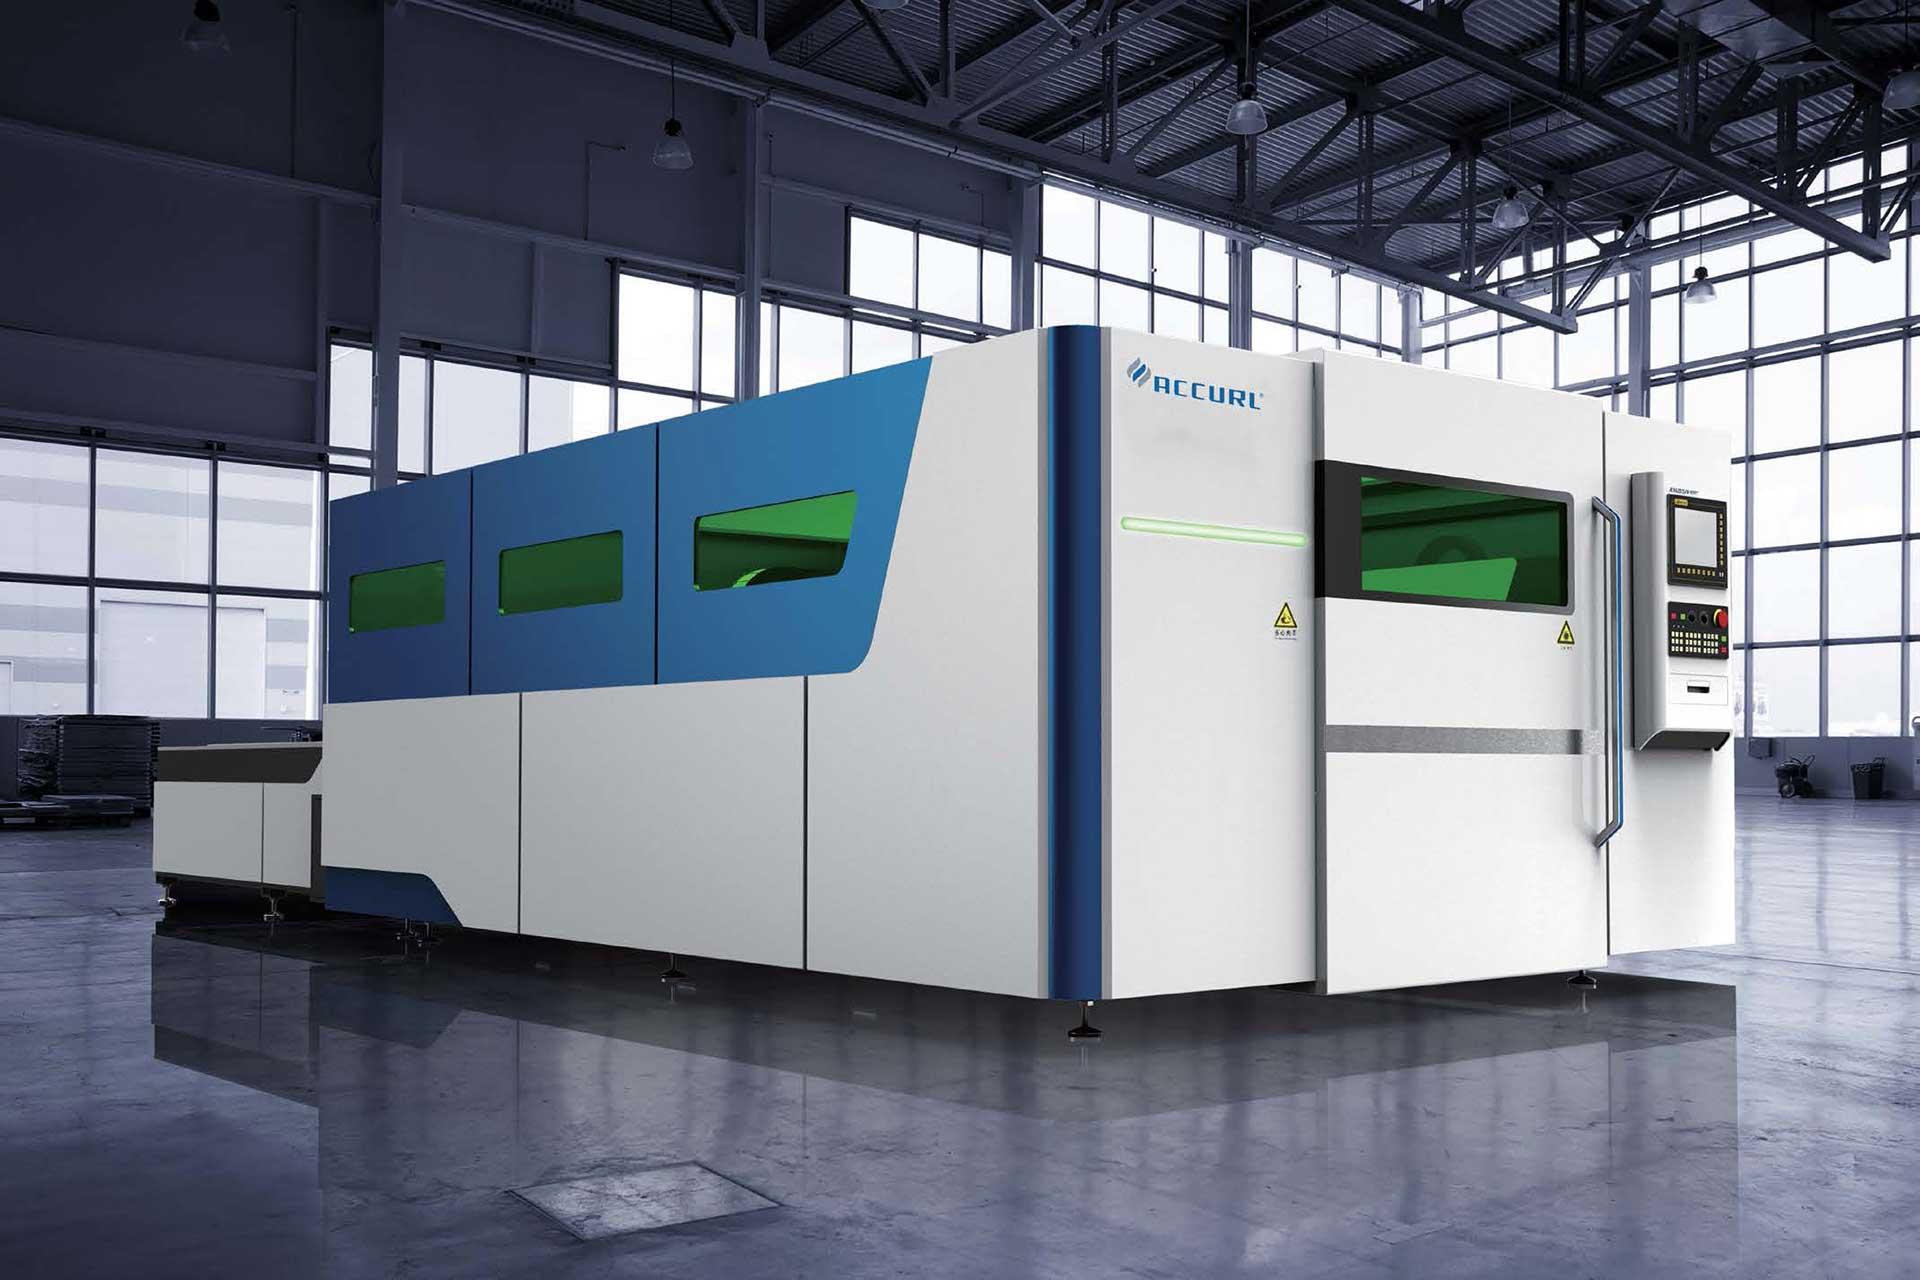 4000w Fiber Laser Cutting Machine China Price For Sale